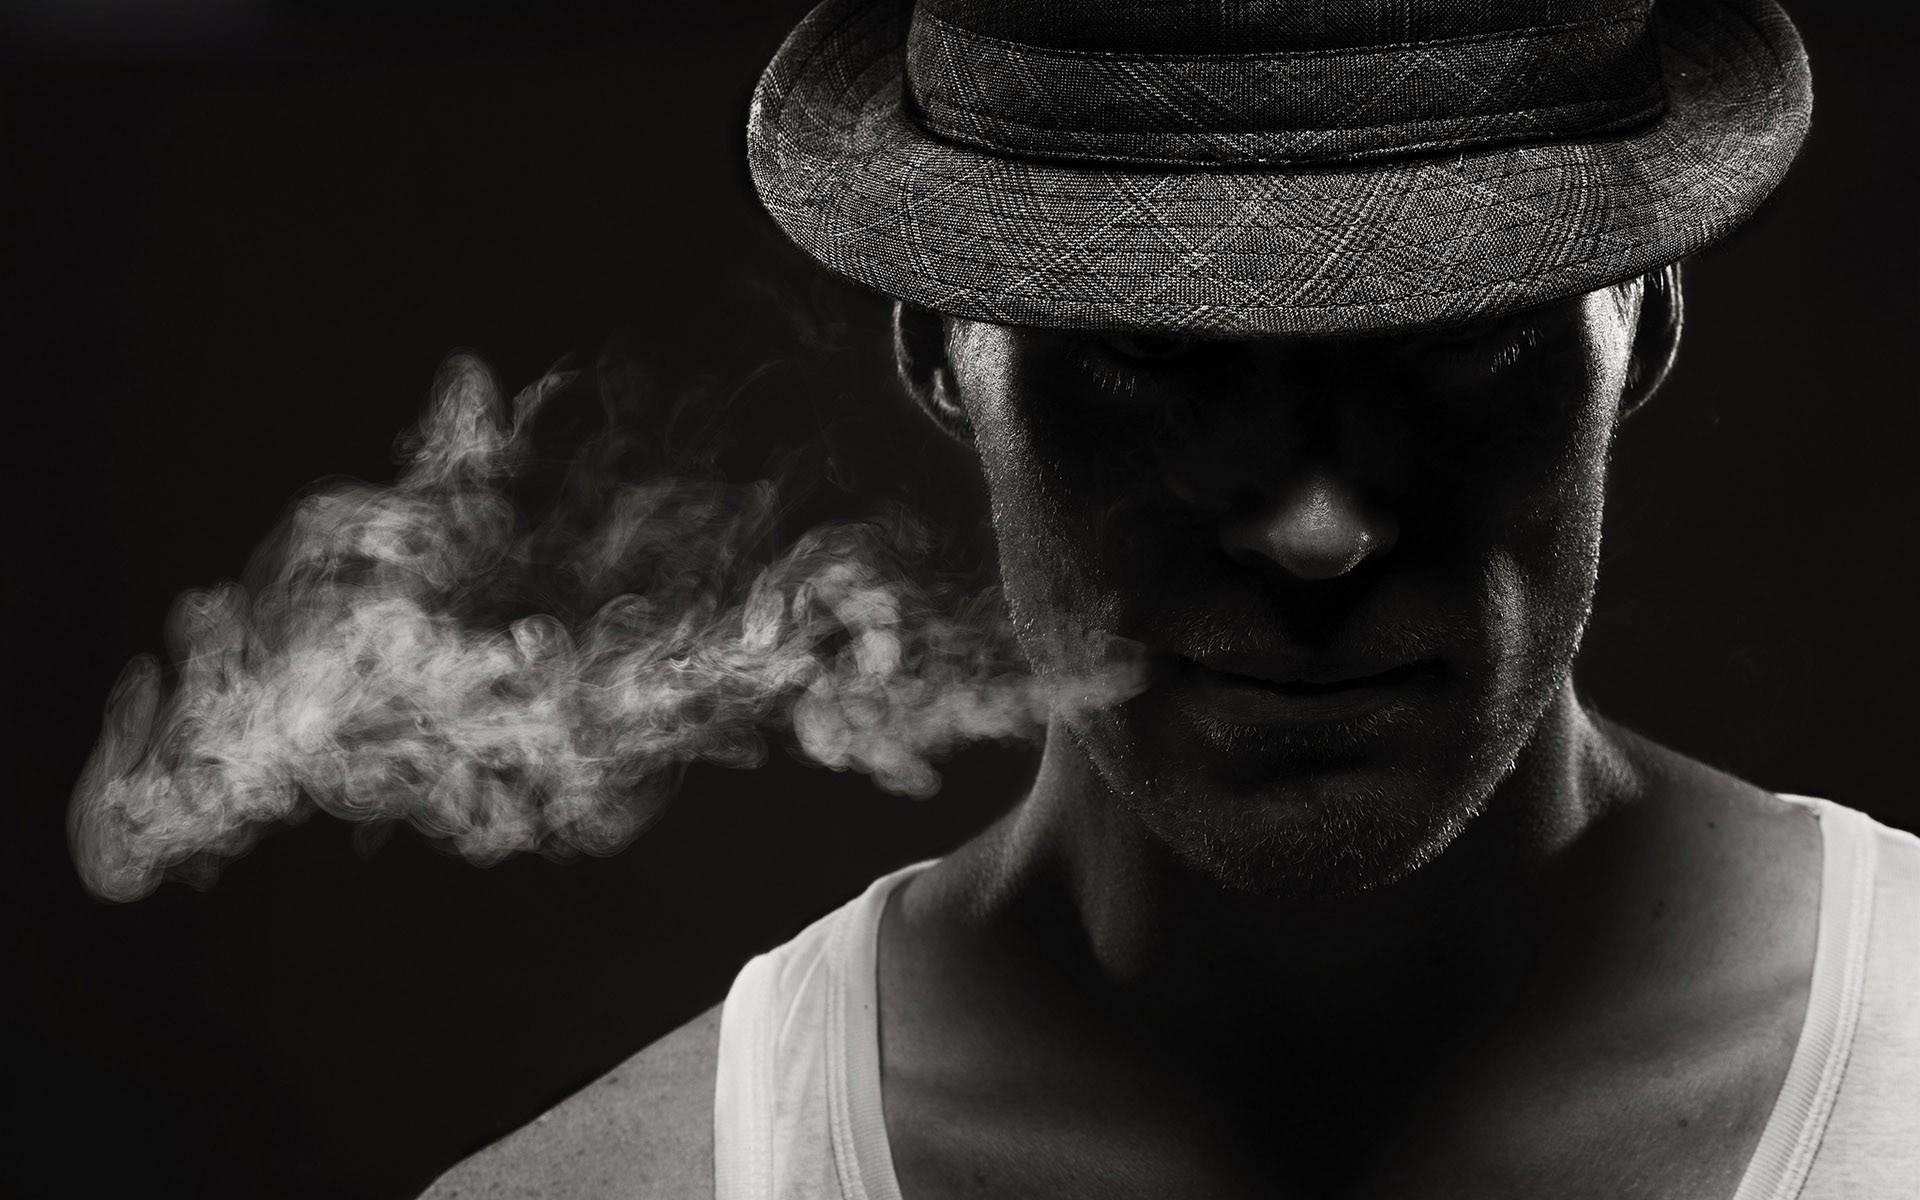 smokeman_cwoeuap9.jpg